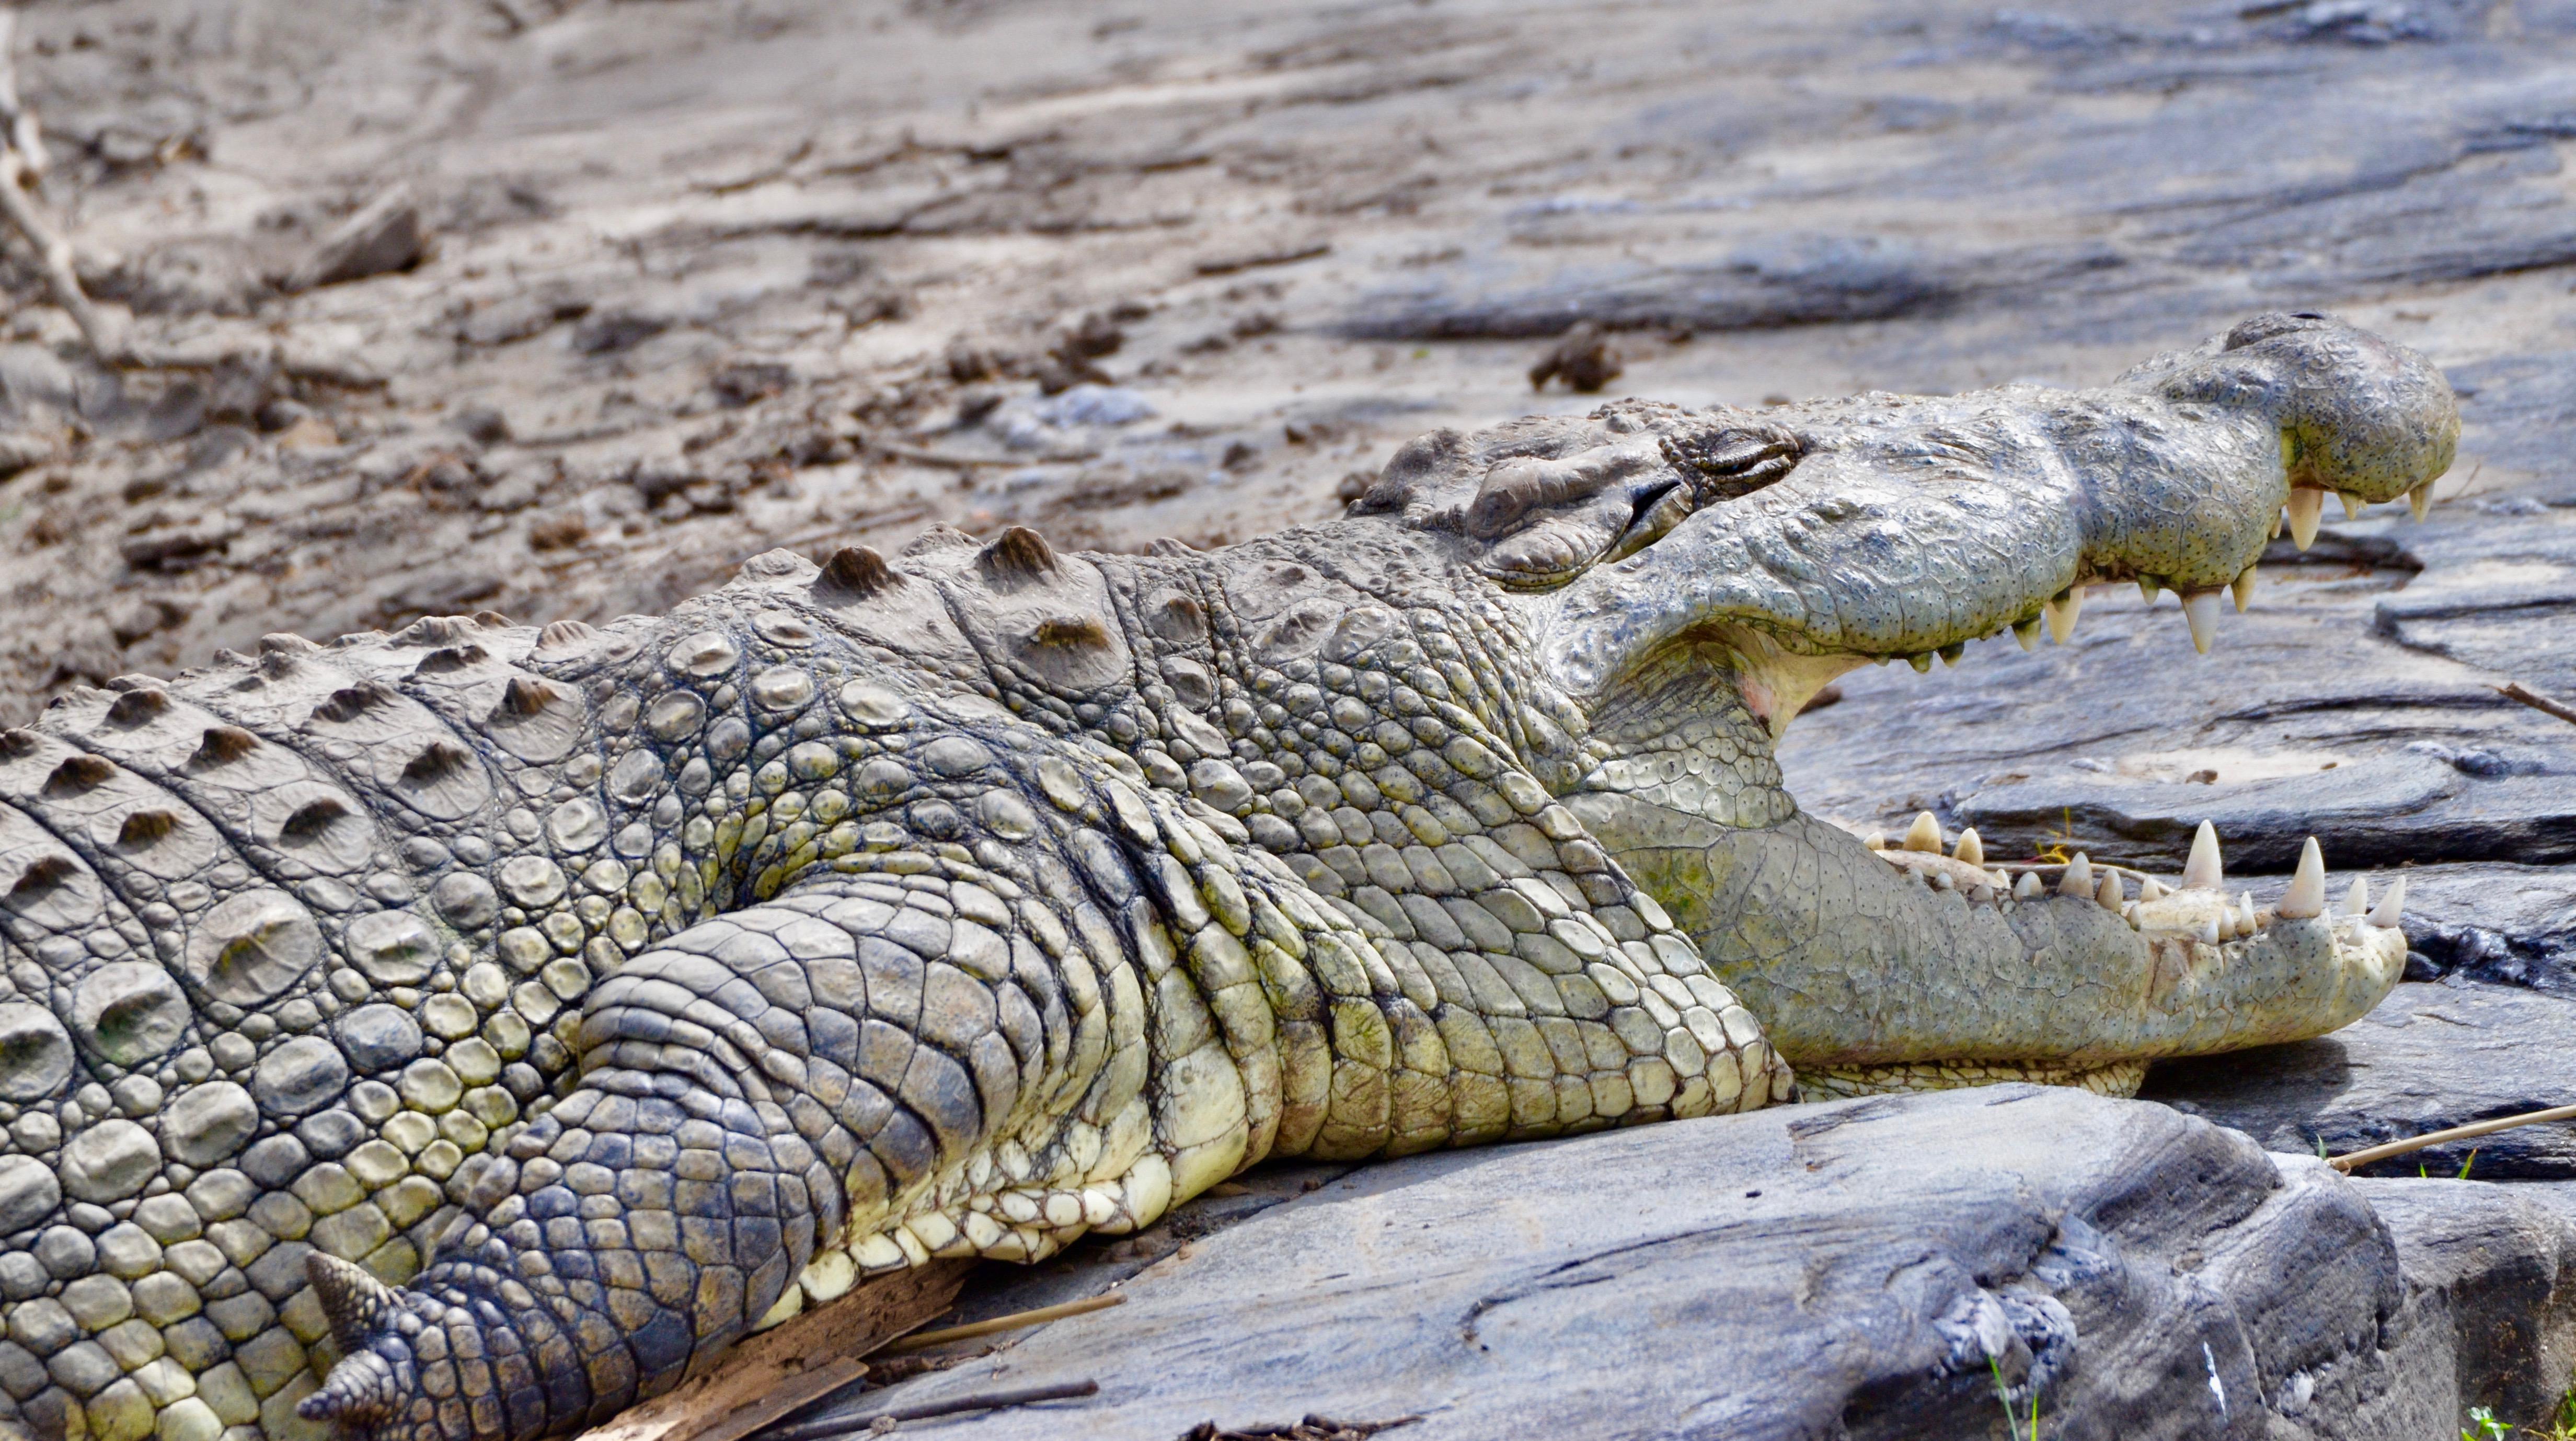 Smiling Croc, Masai Mara